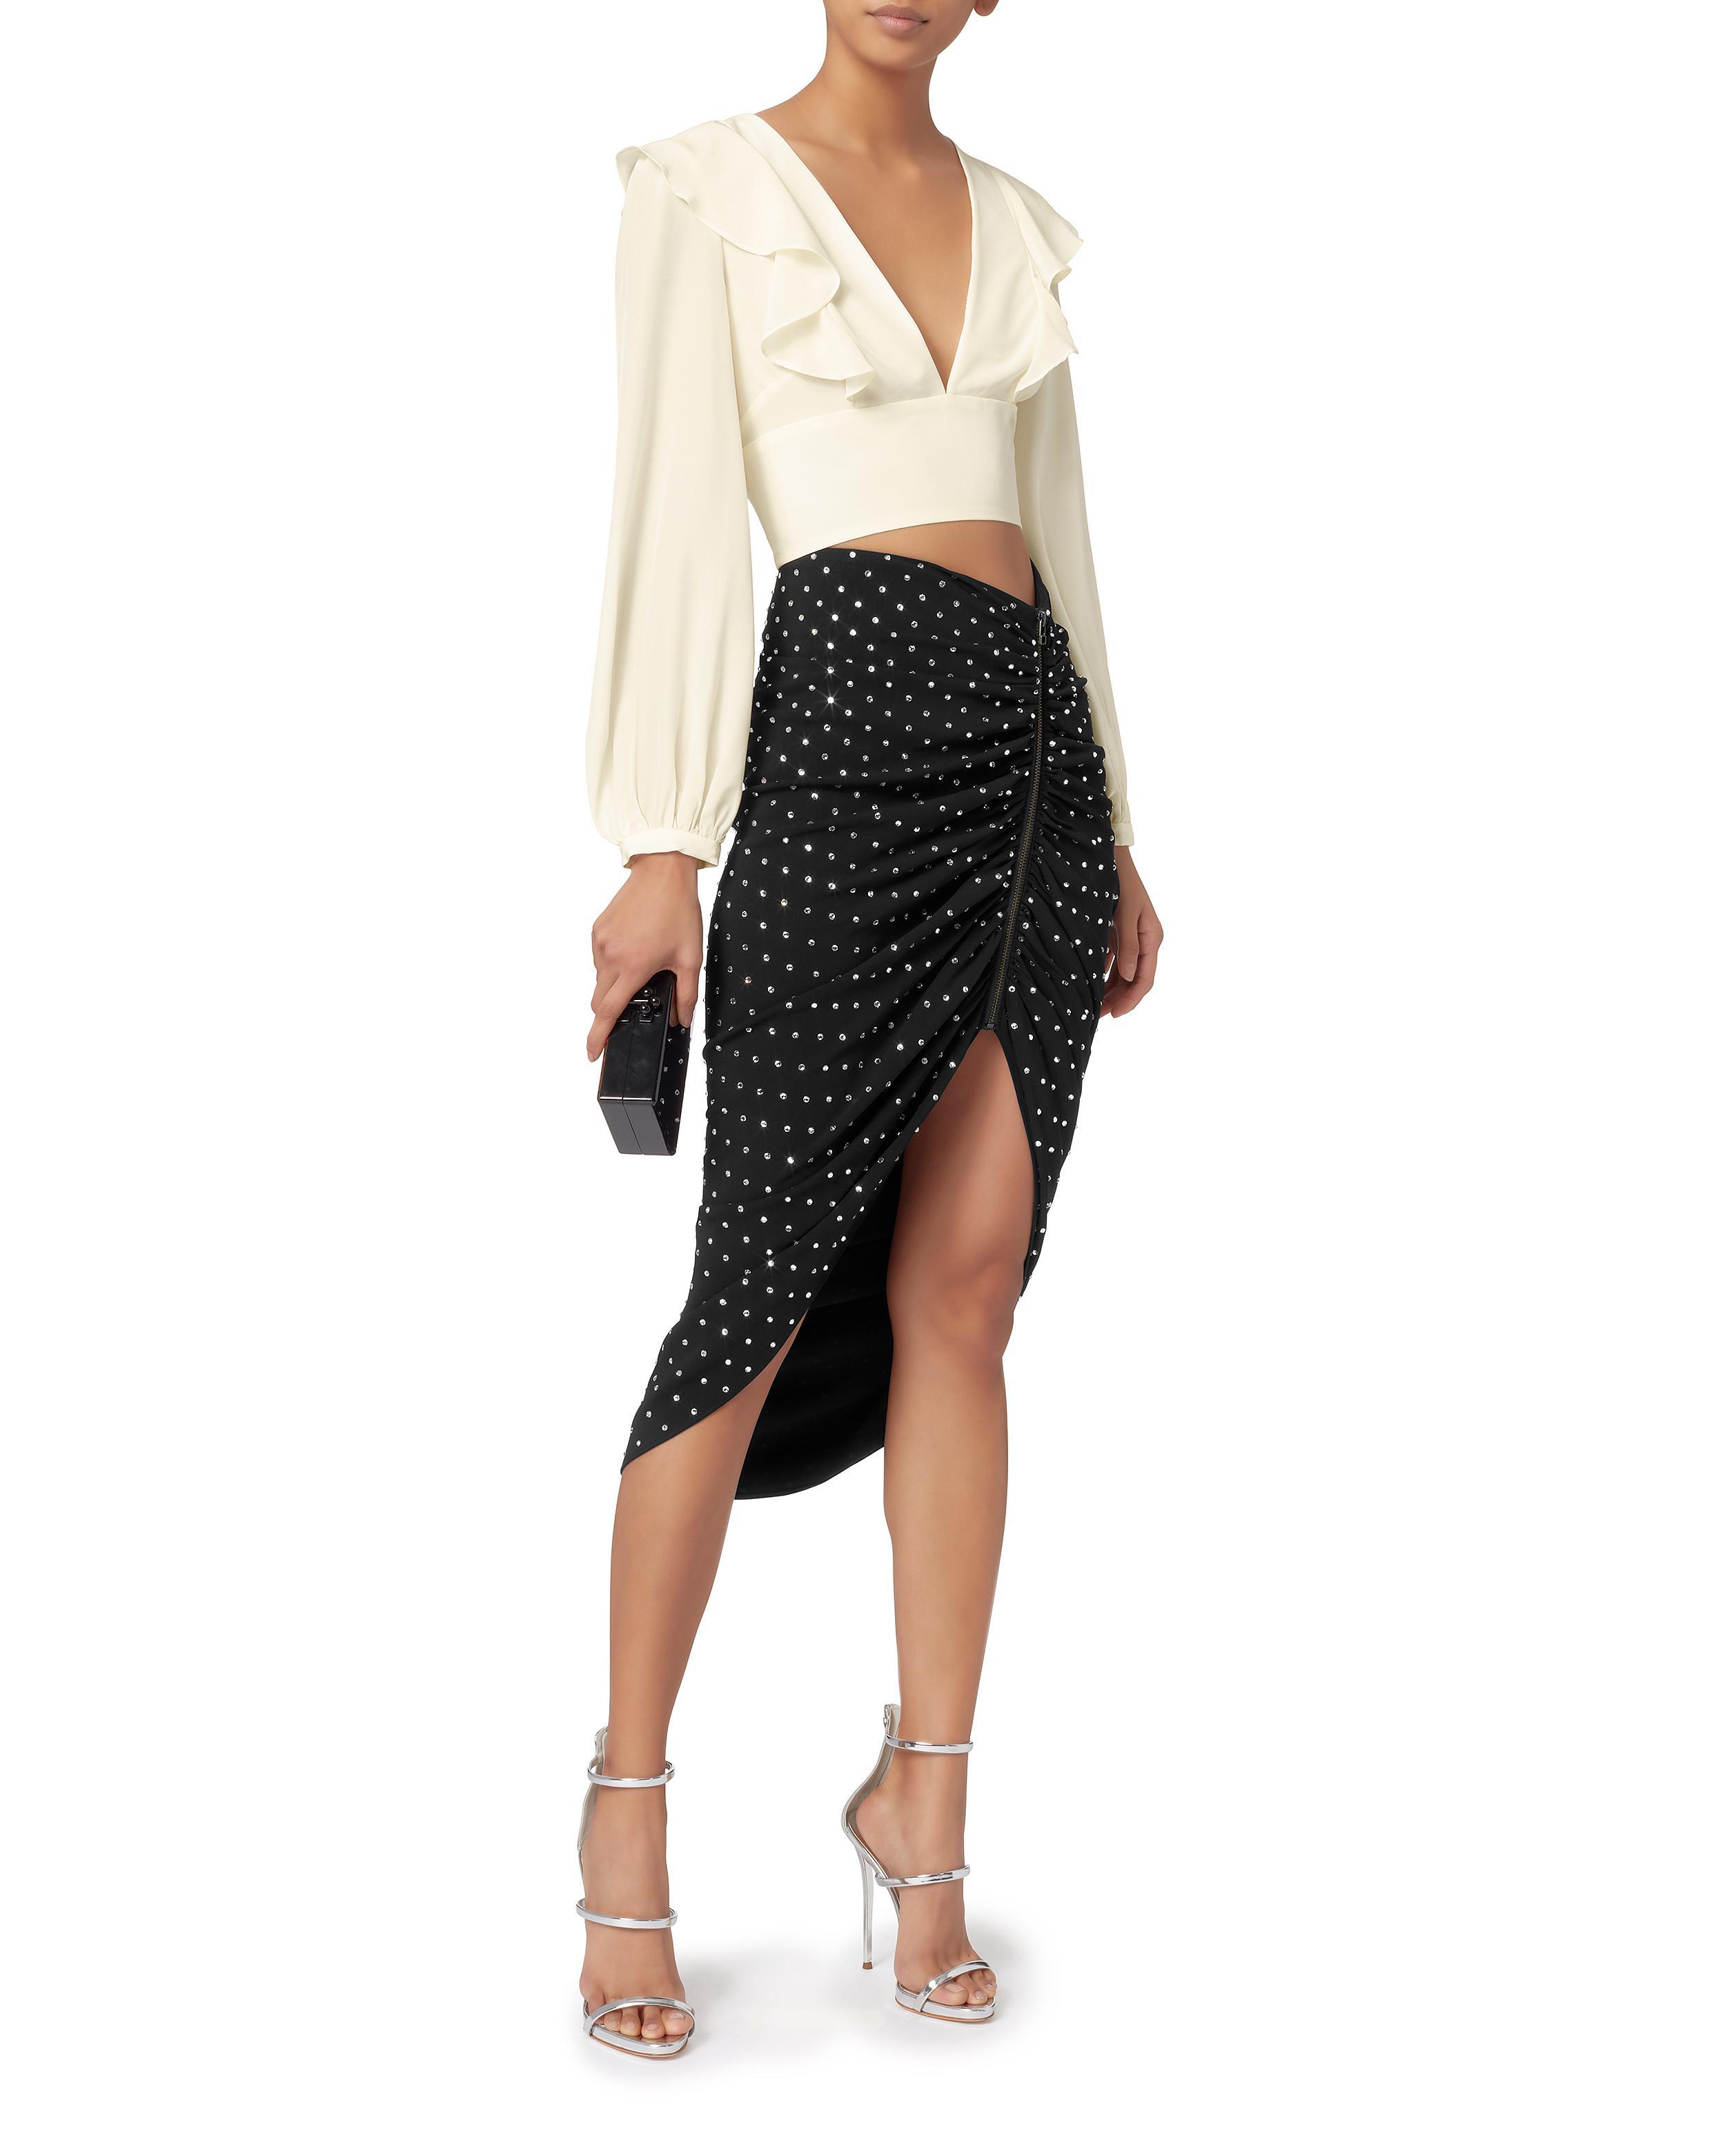 0e06966683d2 Veronica Beard Ari Rhinestone-ruched Skirt in Black - Lyst